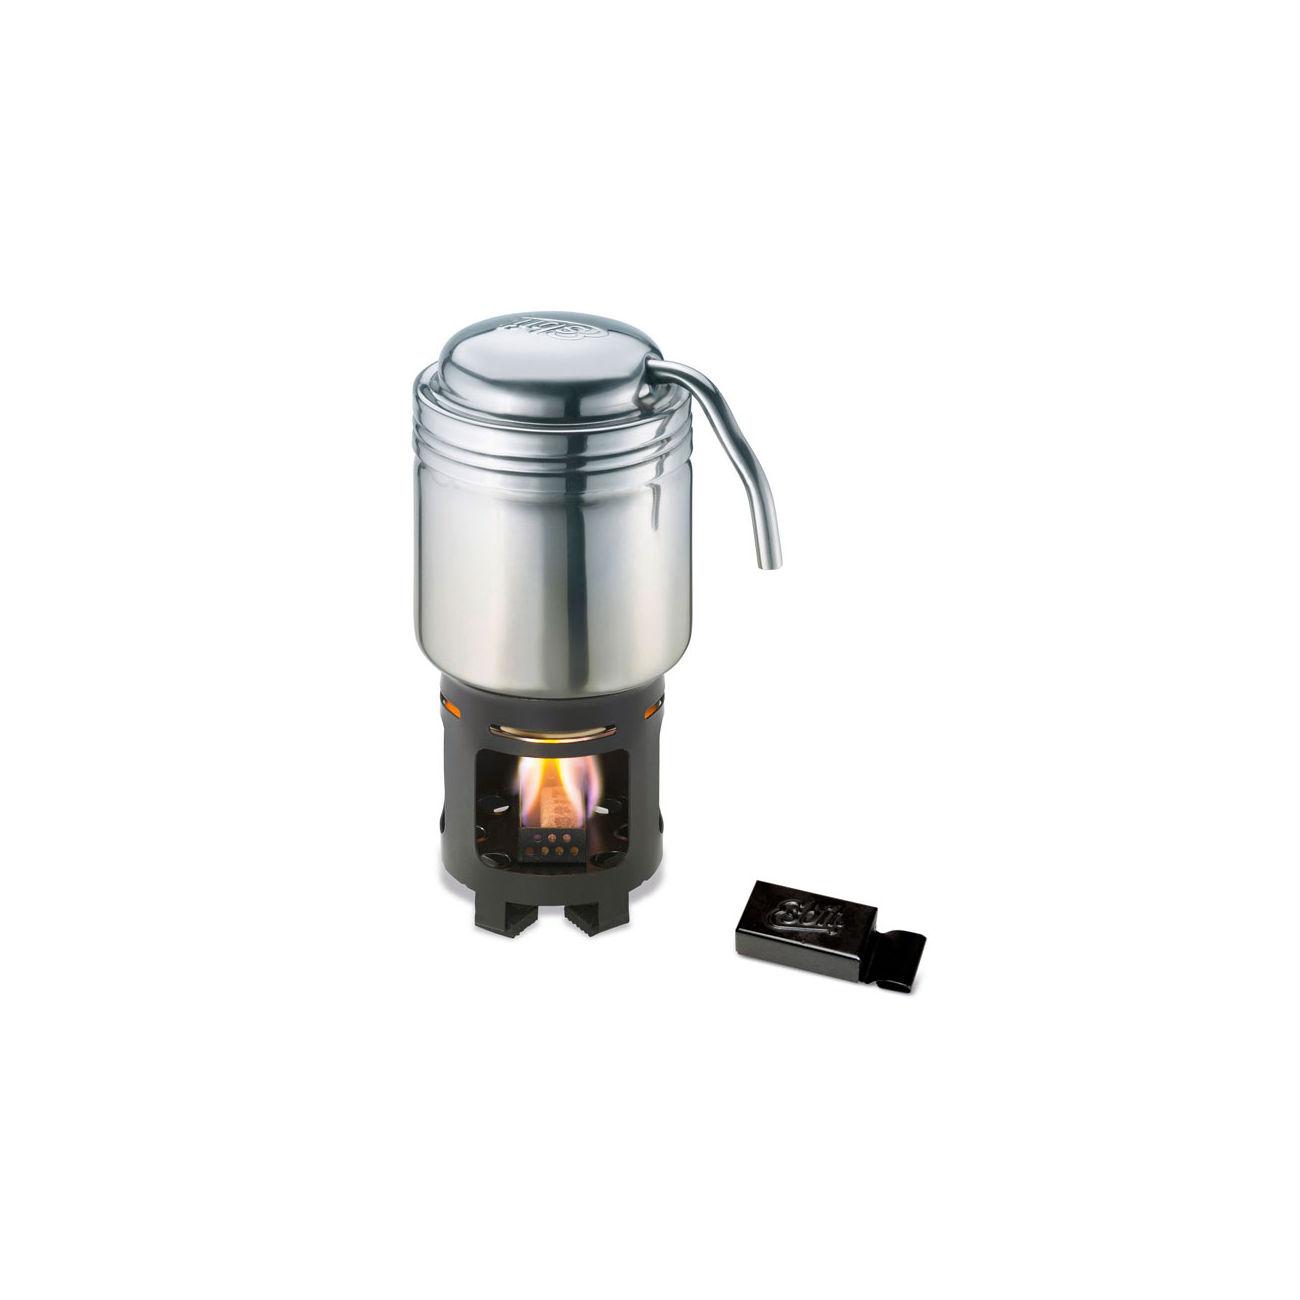 kaffeekocher gas backburner grill nachr sten. Black Bedroom Furniture Sets. Home Design Ideas